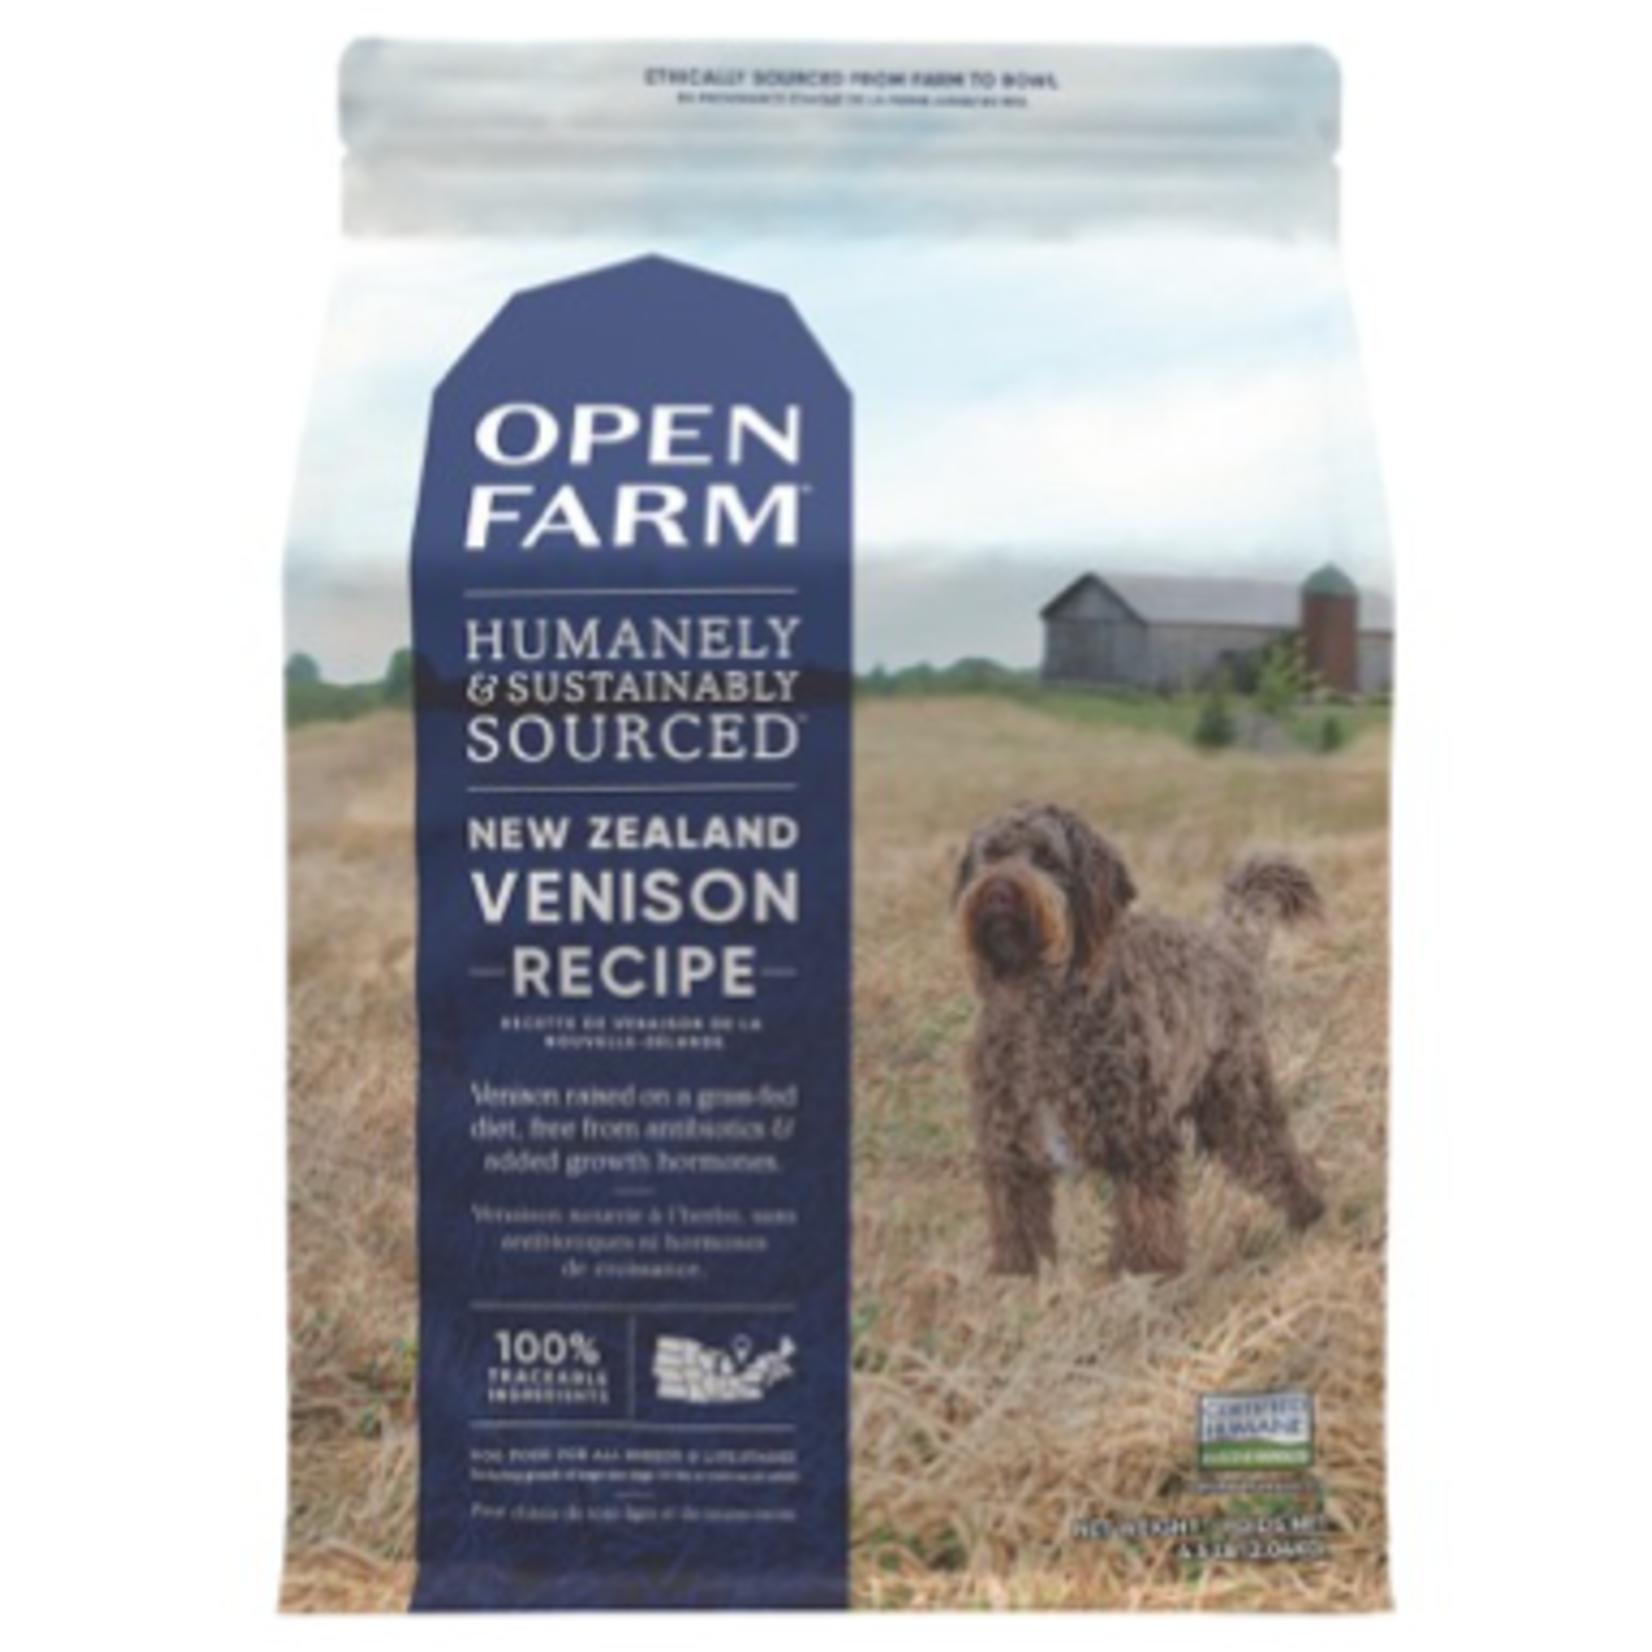 Open Farm New Zealand Venison-Dry Food-Dog